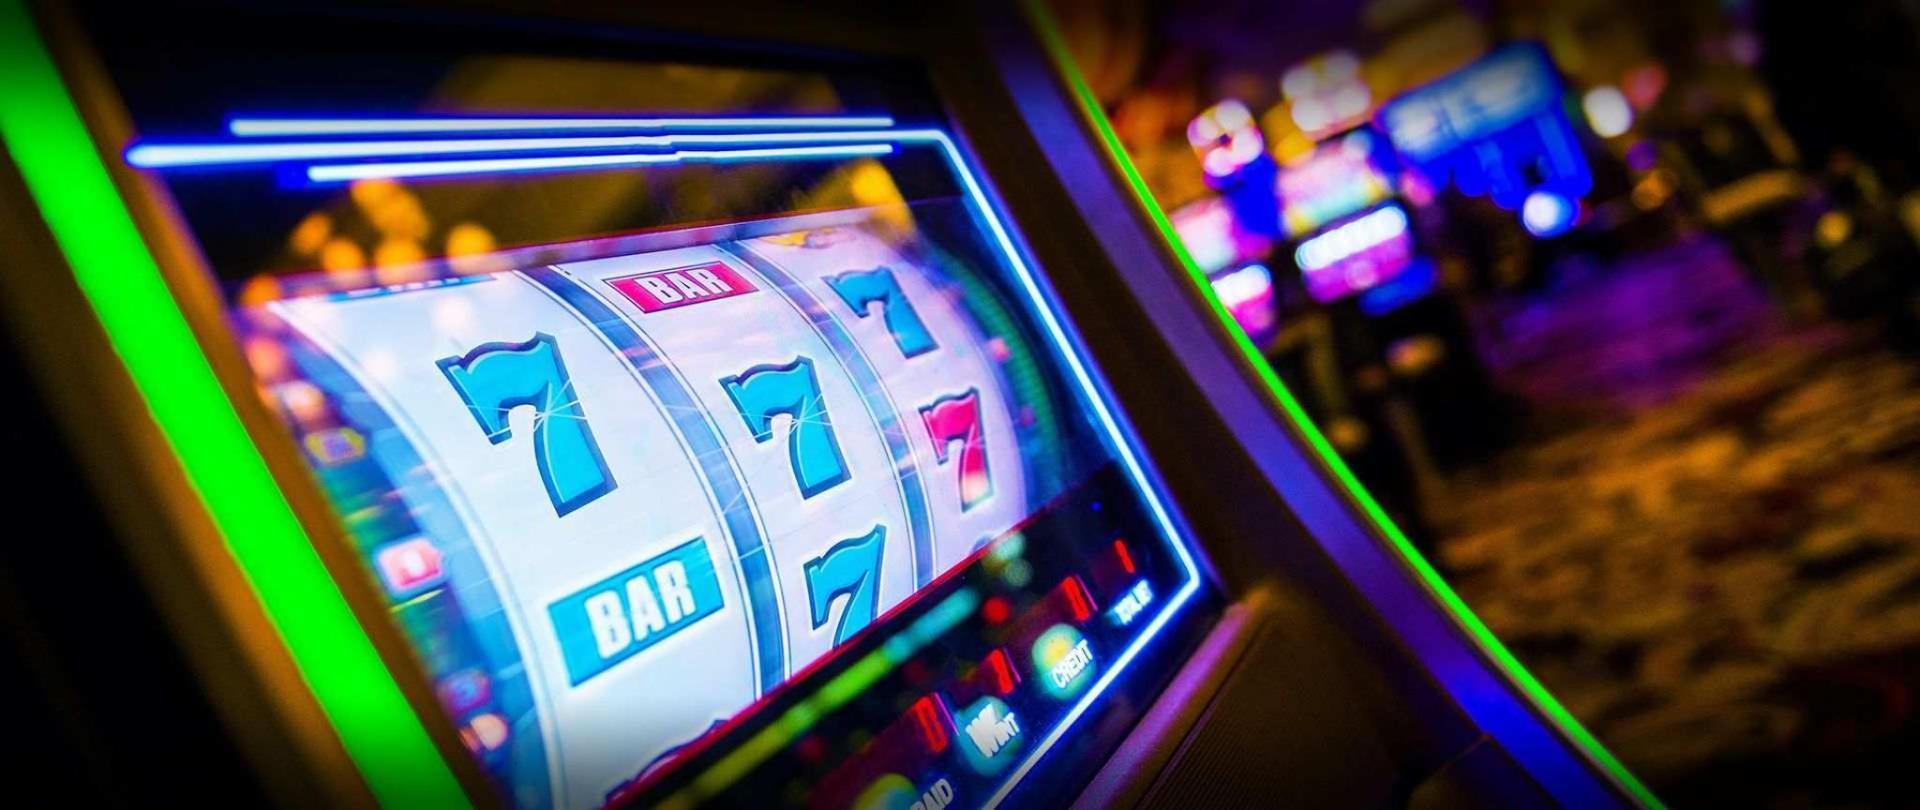 Spielautomaten kernschmelze